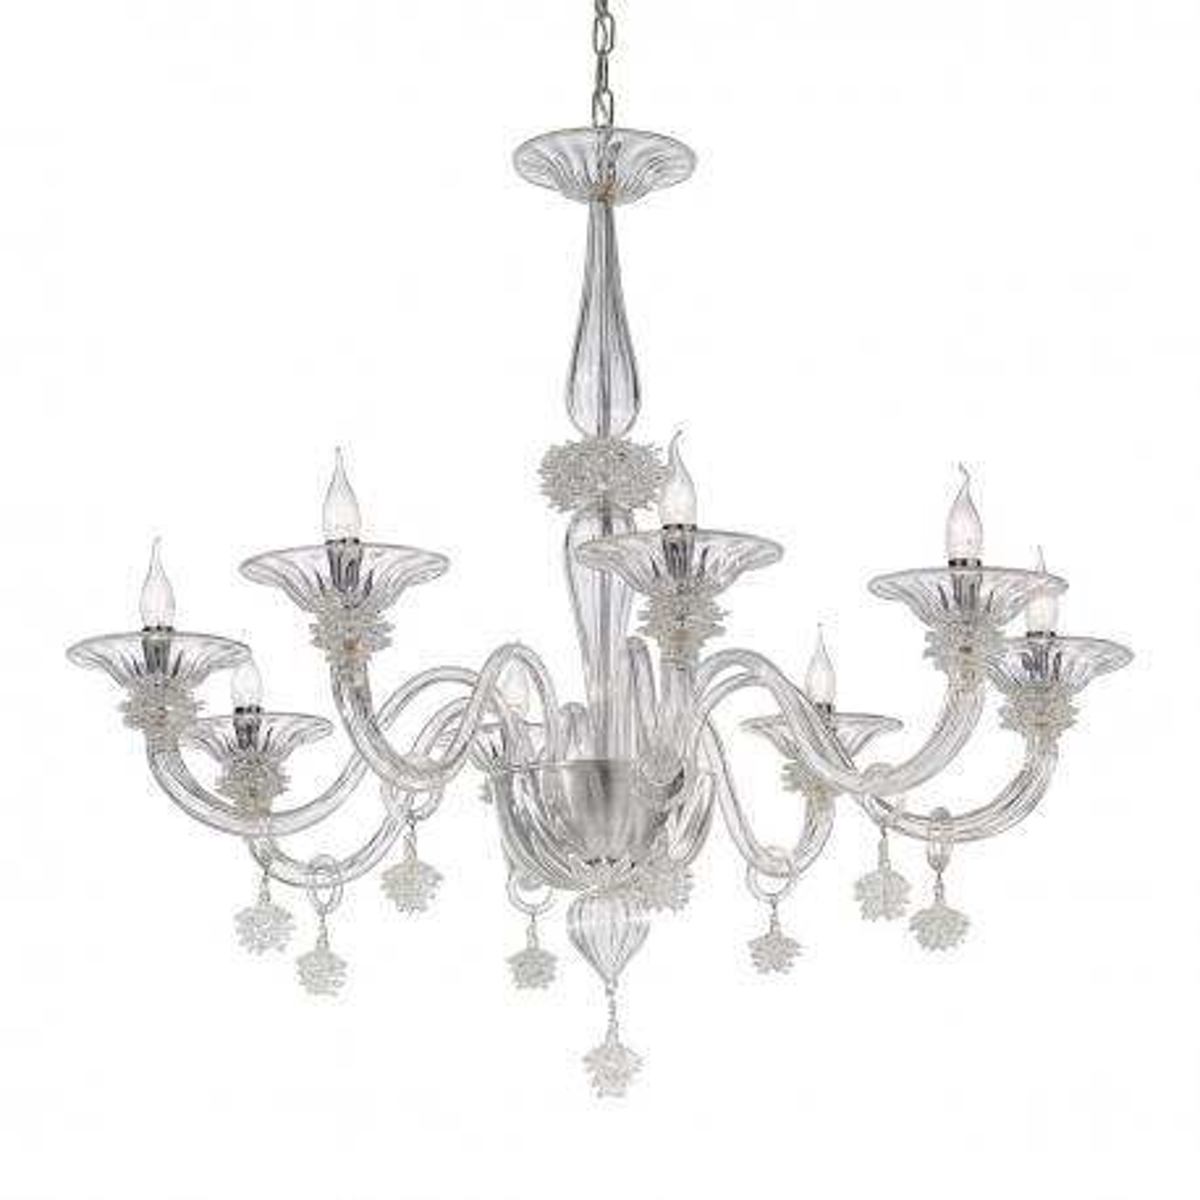 """Fatima"" lustre en cristal de Murano - 8 lumières - transparent"